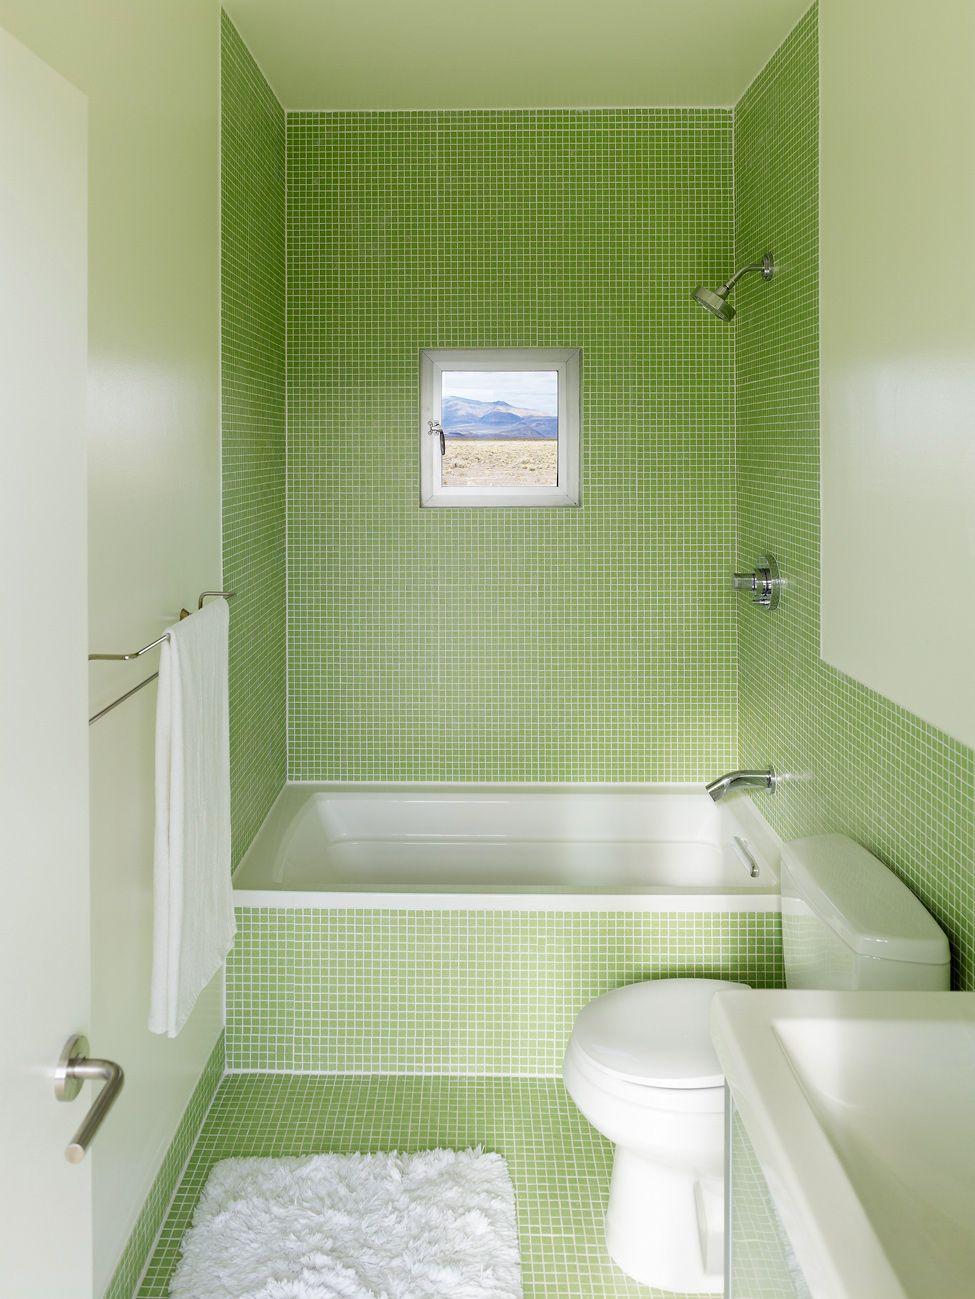 Glamorous Modern Light Green Bathroom with Minimalist White Bathtubs ...